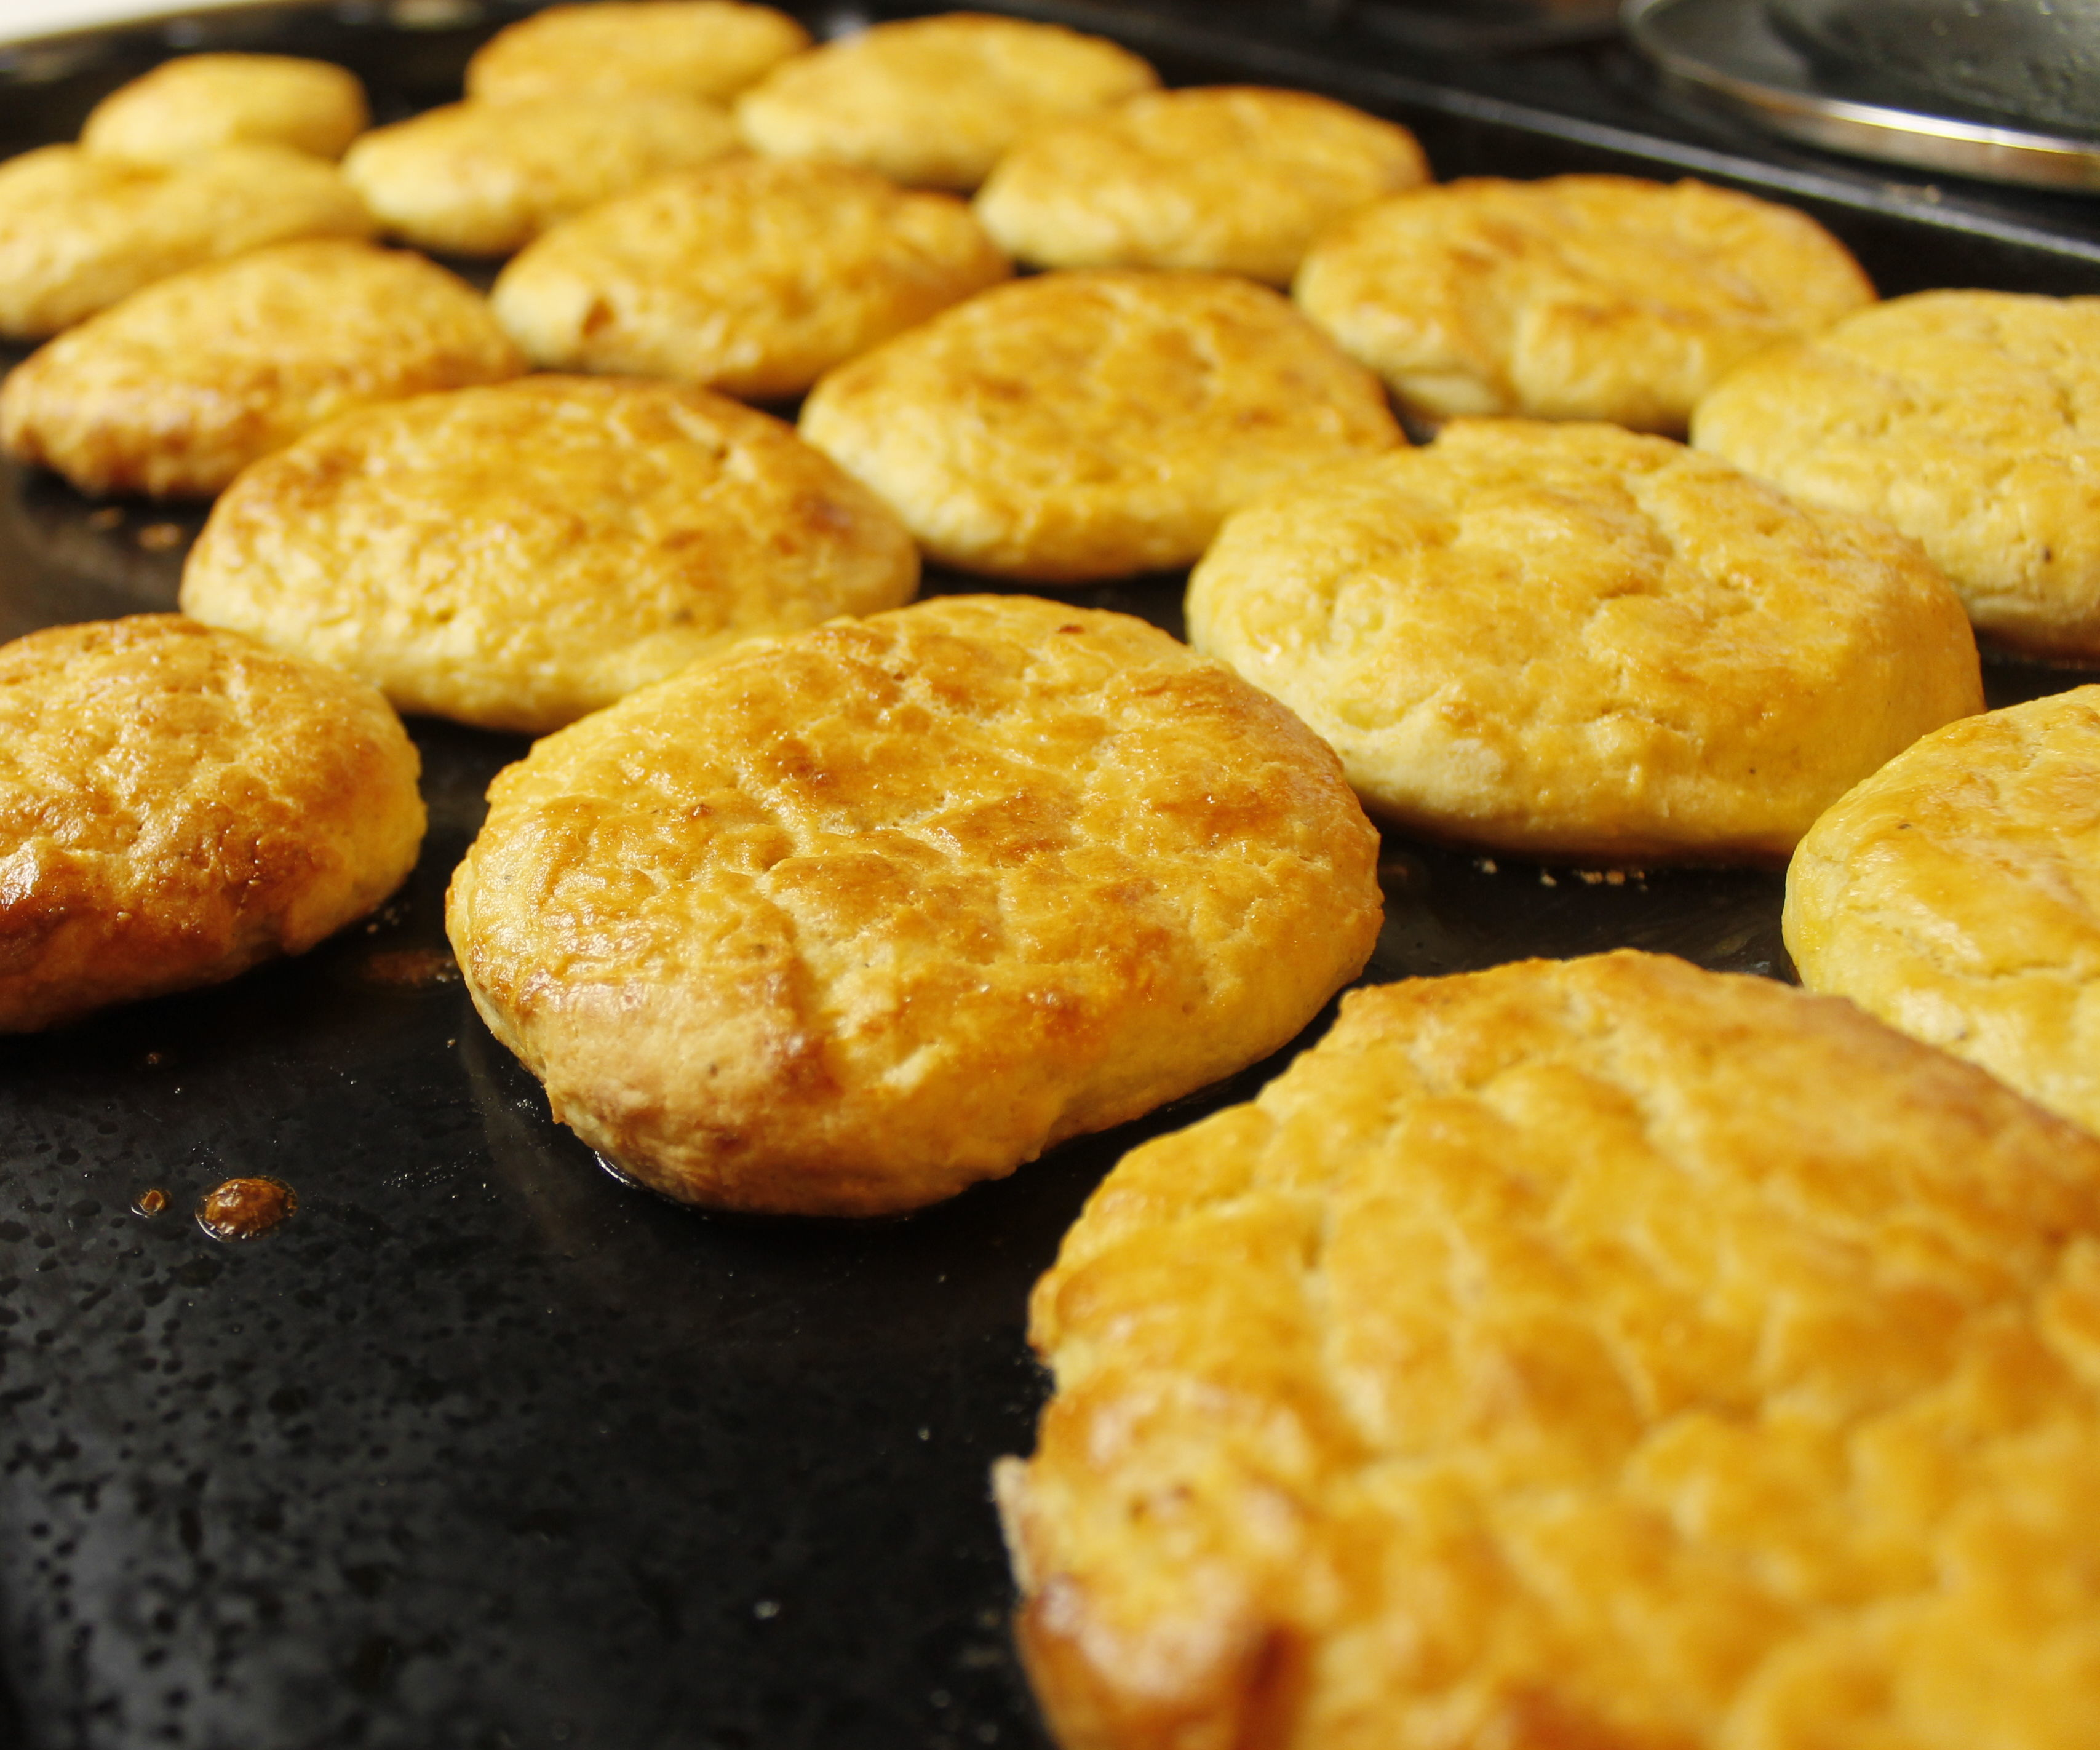 Potato Cakes with left over potato